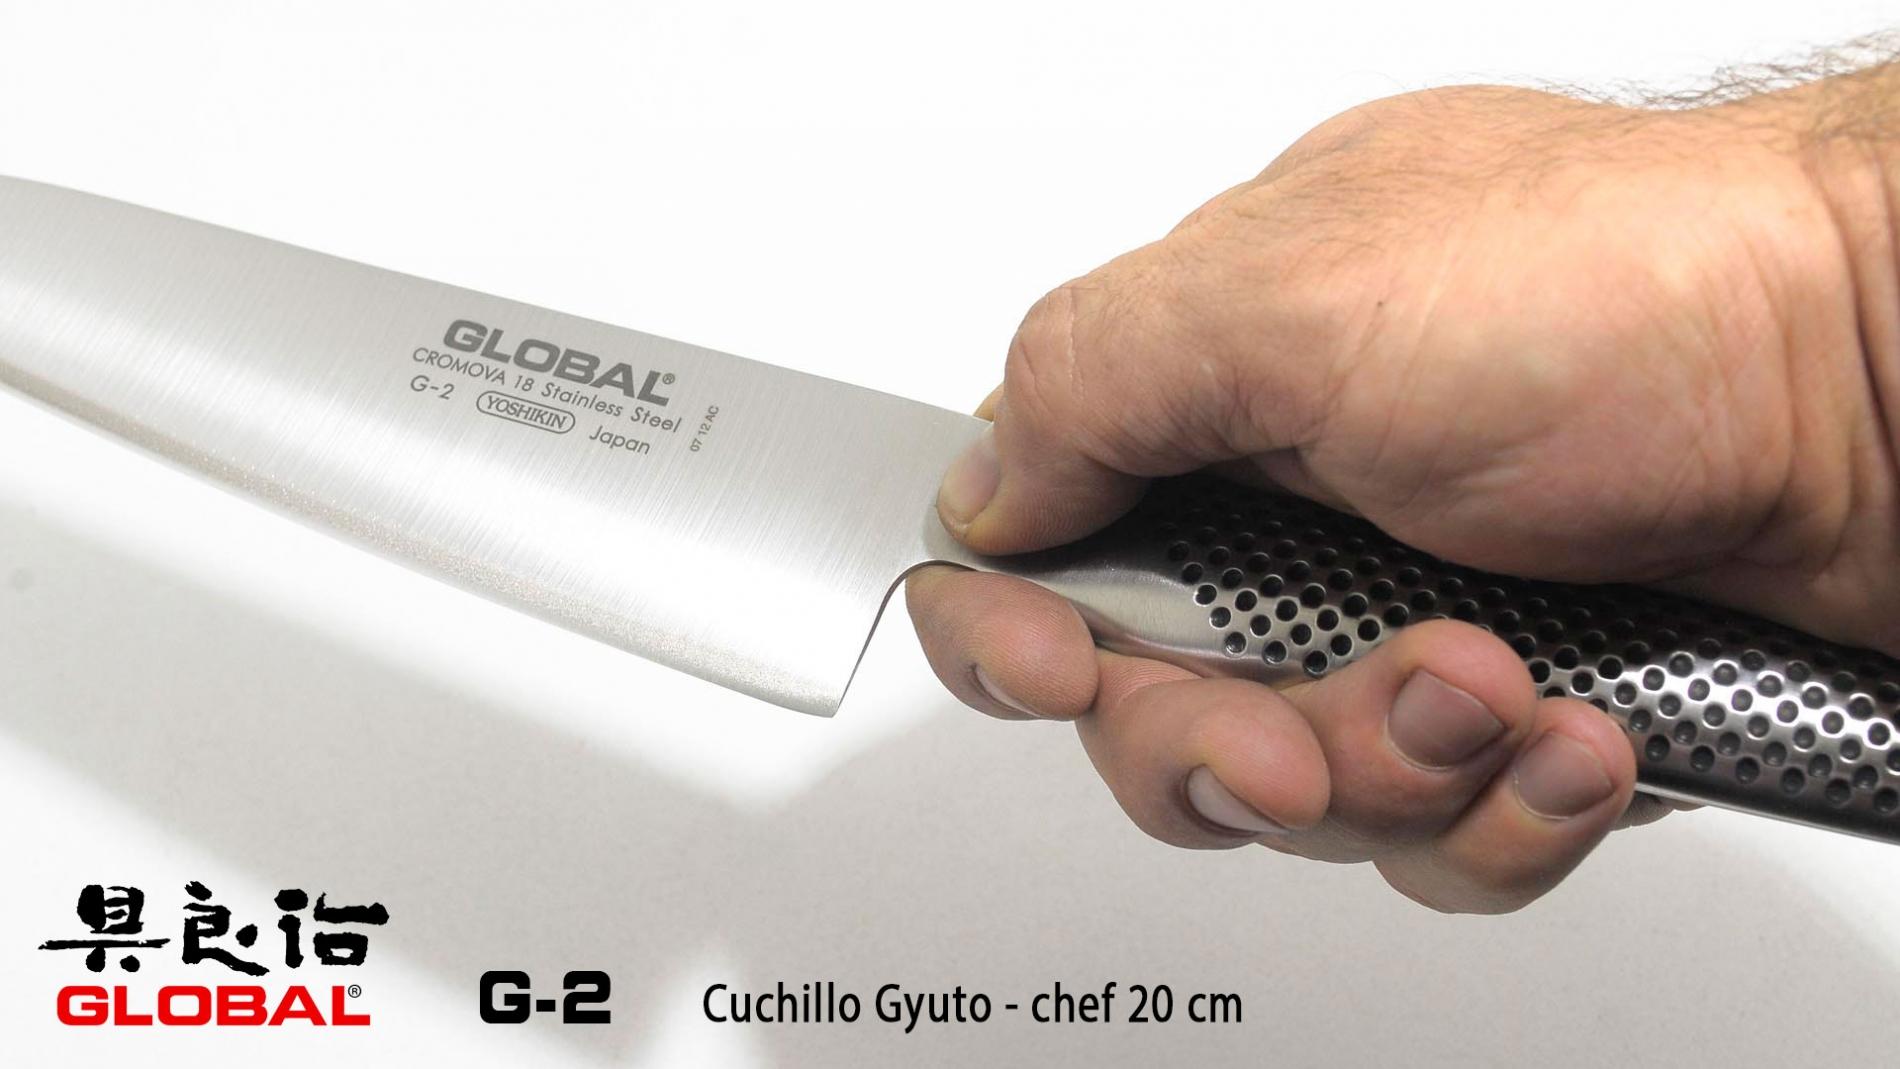 G-2-Cuchillo Gyuto 20cm de chef  Global G-2-max-2.